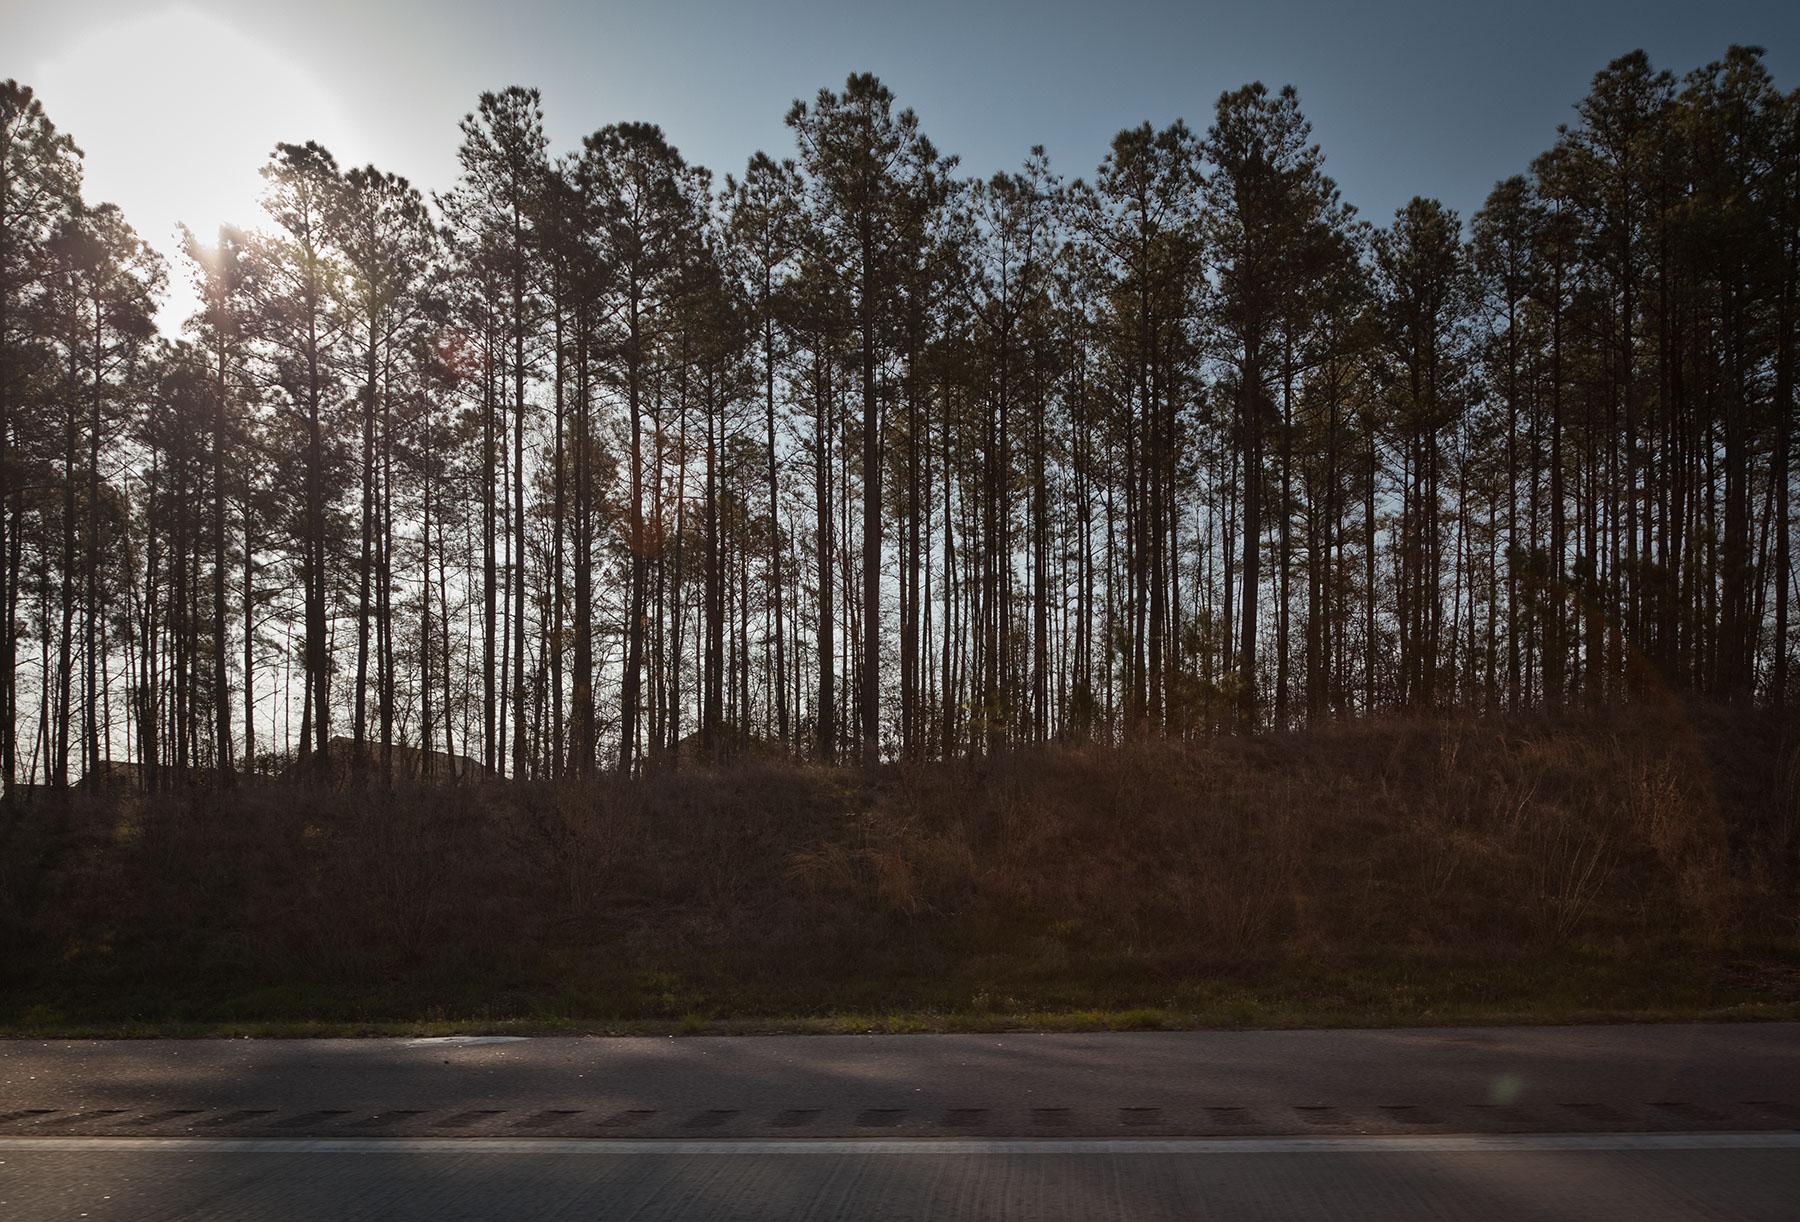 Highway 264, North Carolina